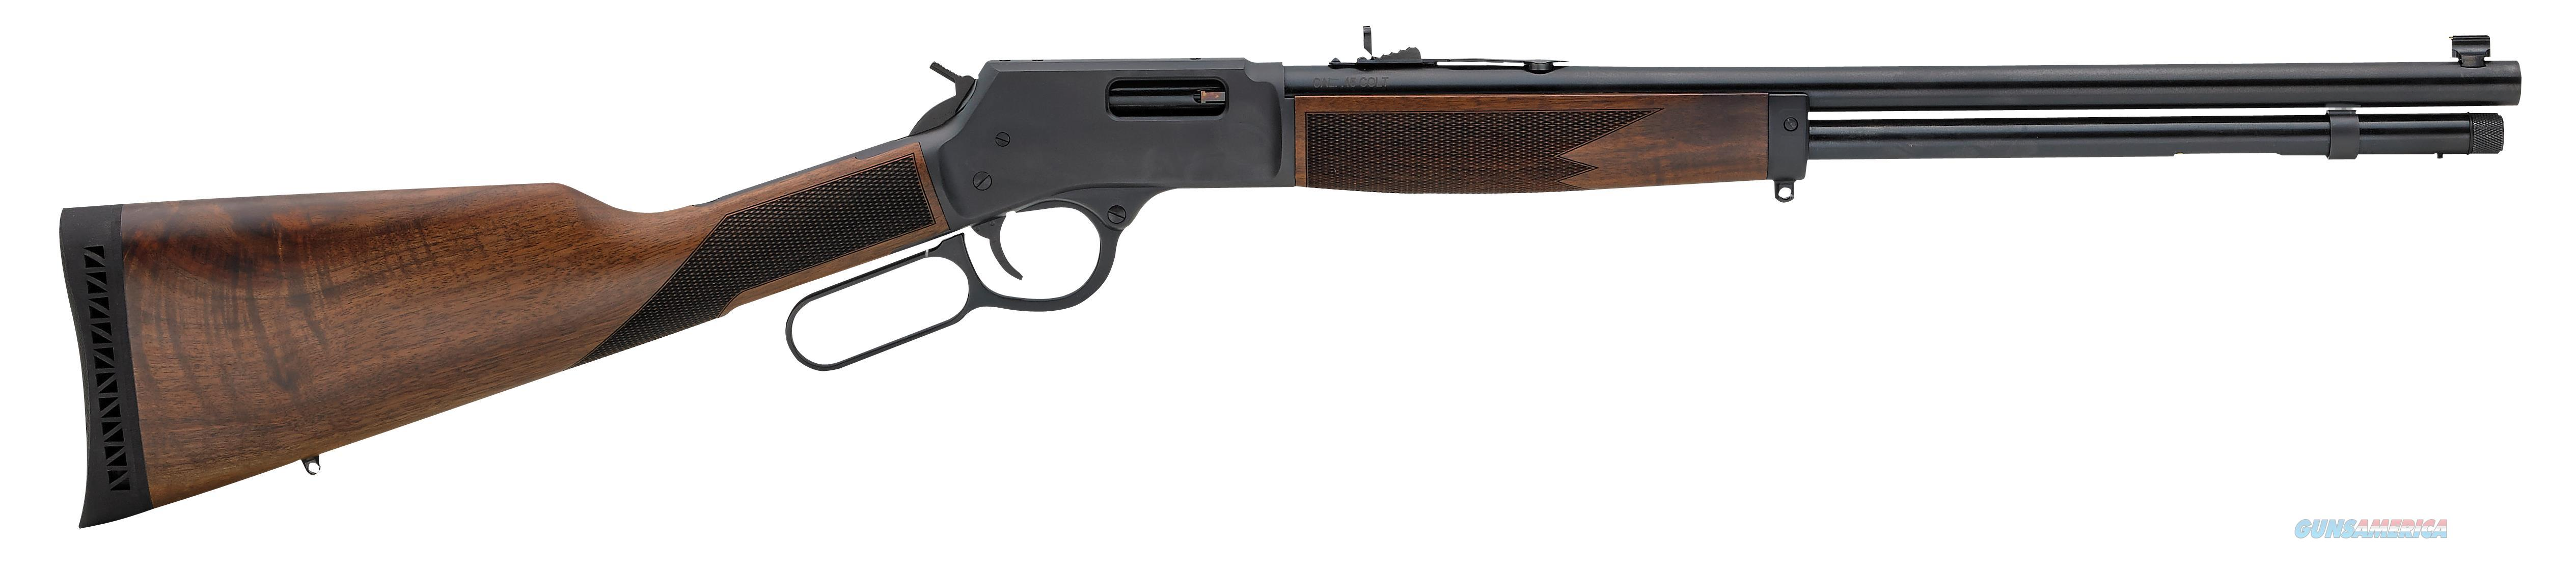 "Henry H012r Big Boy Steel Carbine Lever 44 Remington Magnum 16.5"" 7+1 American Walnut Stk Blued H012R  Guns > Rifles > H Misc Rifles"